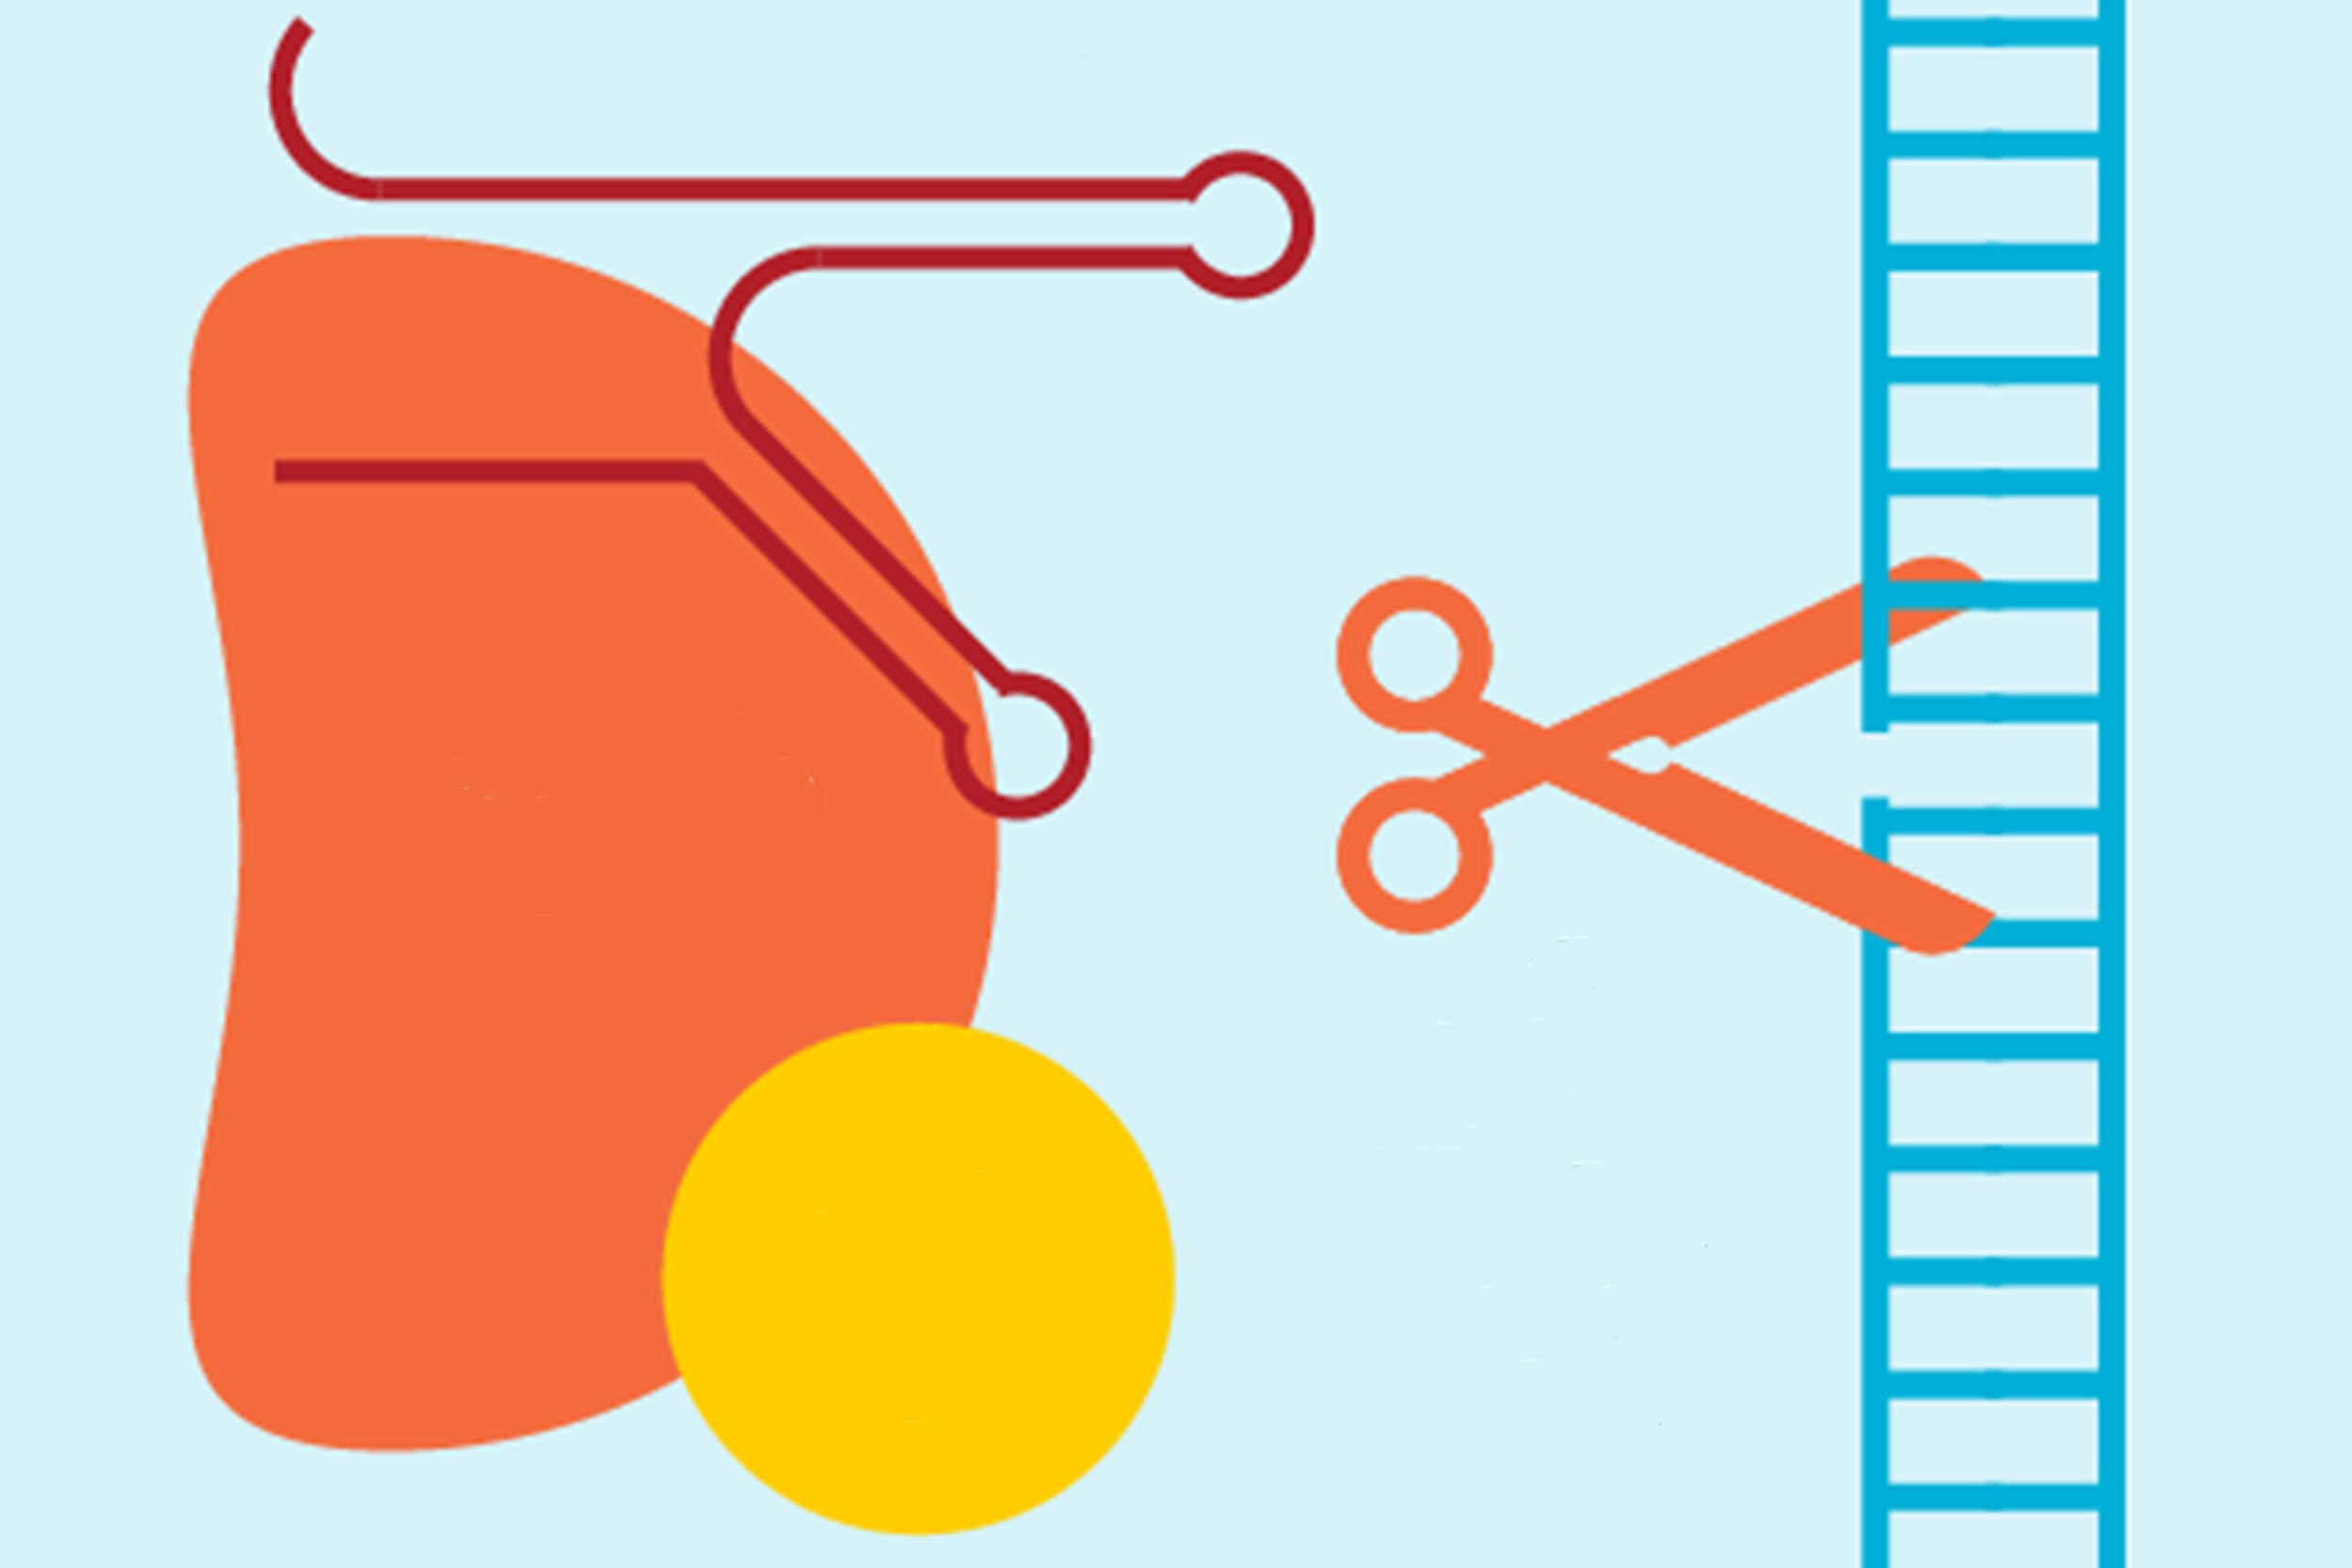 New CRISPR genome-editing system can target disease-causing genetic variations